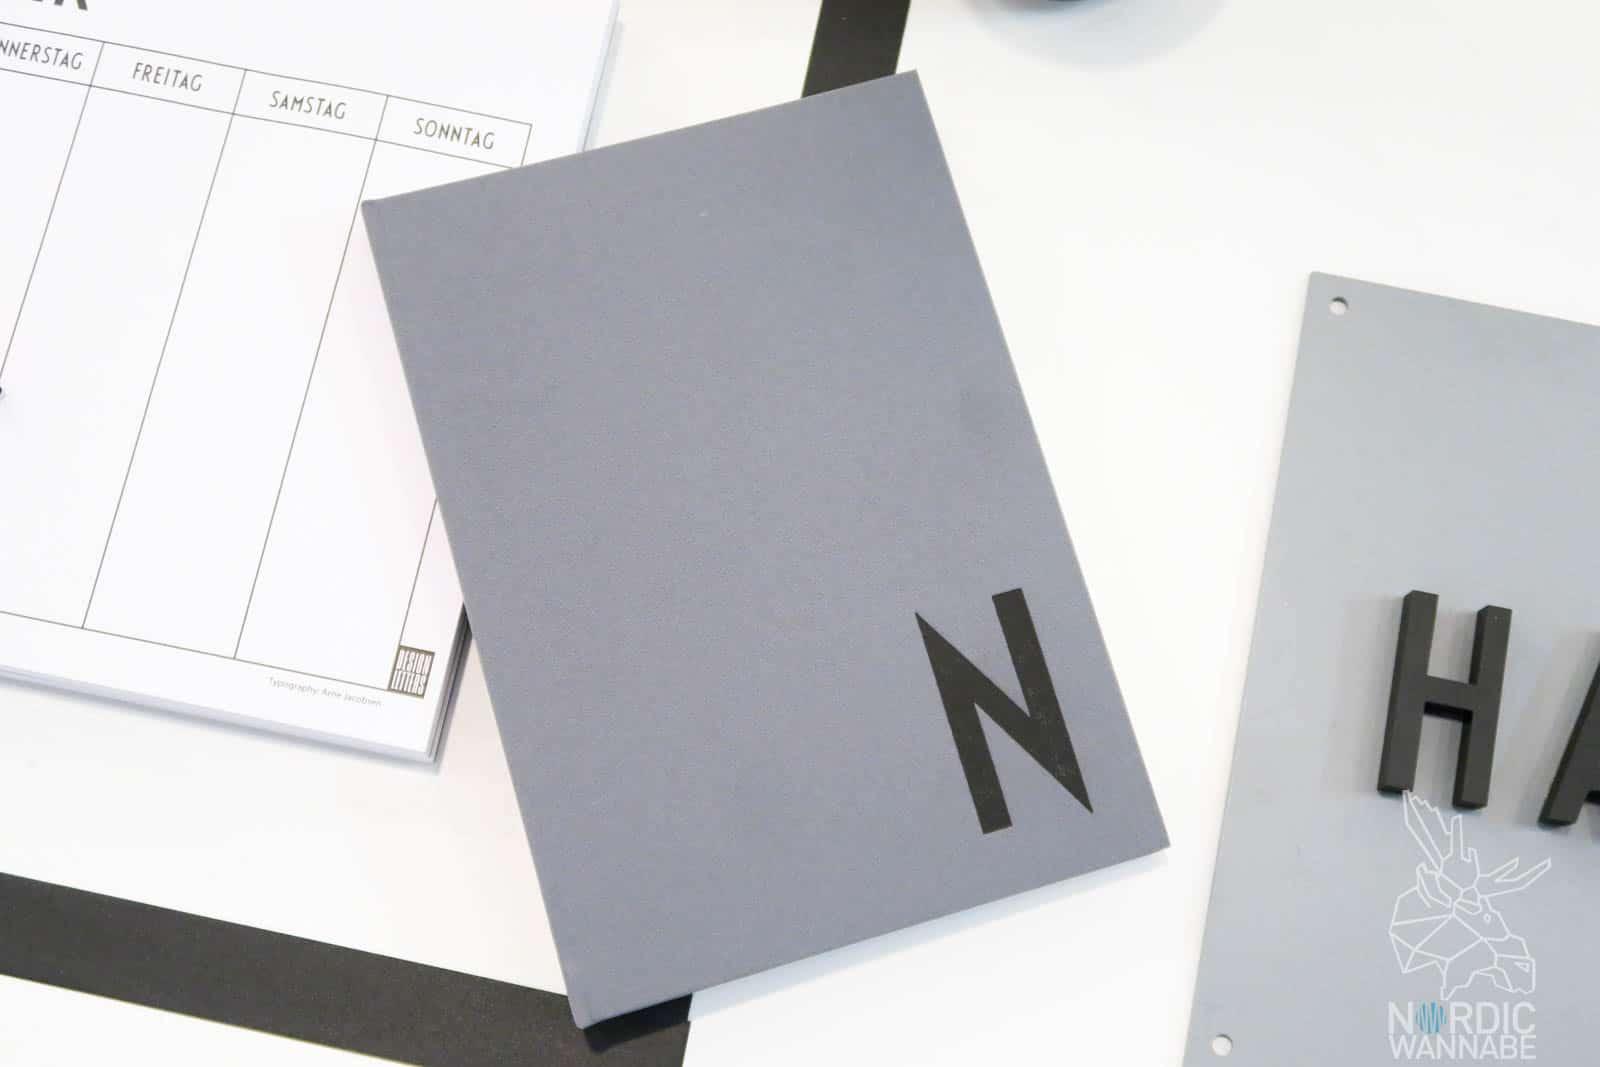 Skandinavisches Design, Dänemark Blog,, Hygge, Arne Jacobsen, Ambiente, Frankfurt, Skandinavisch Wohnen, Dänemark, Design Letters, , Design, Kopenhagen